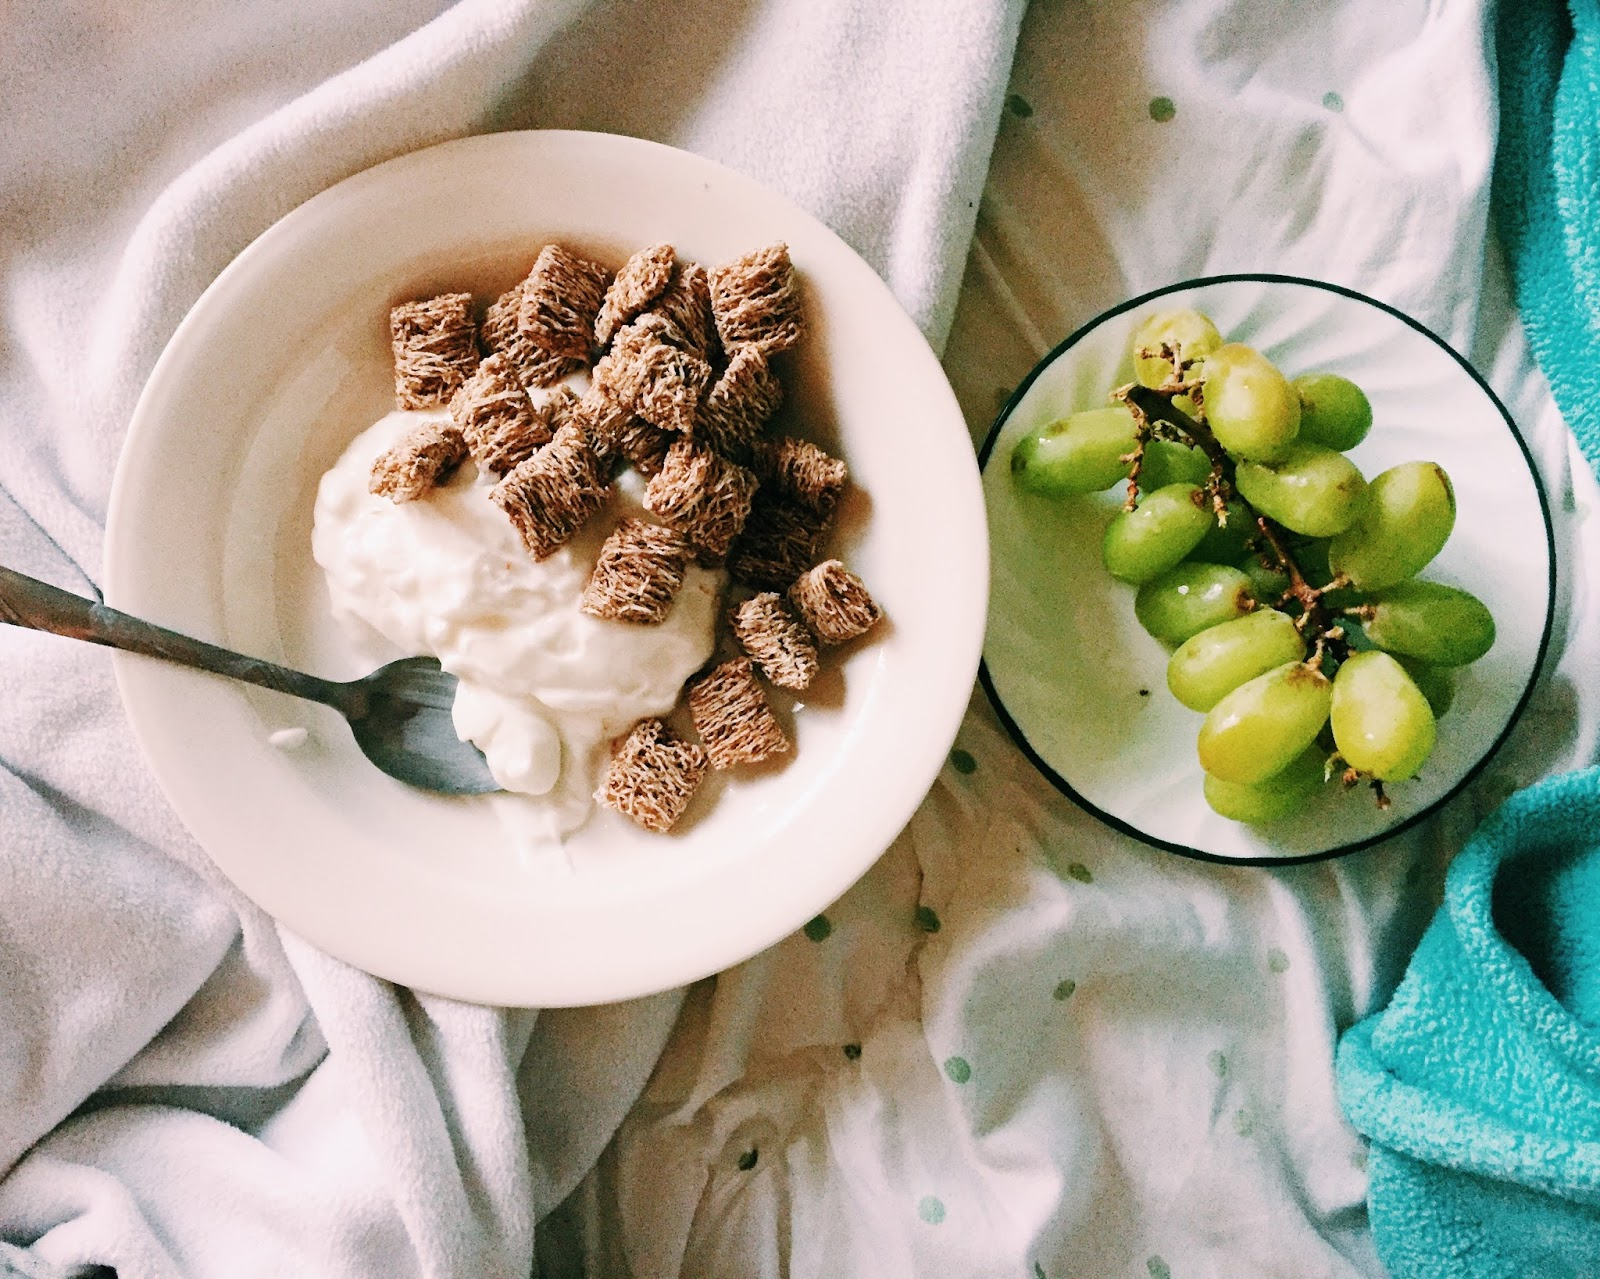 Healthy Living Take 2